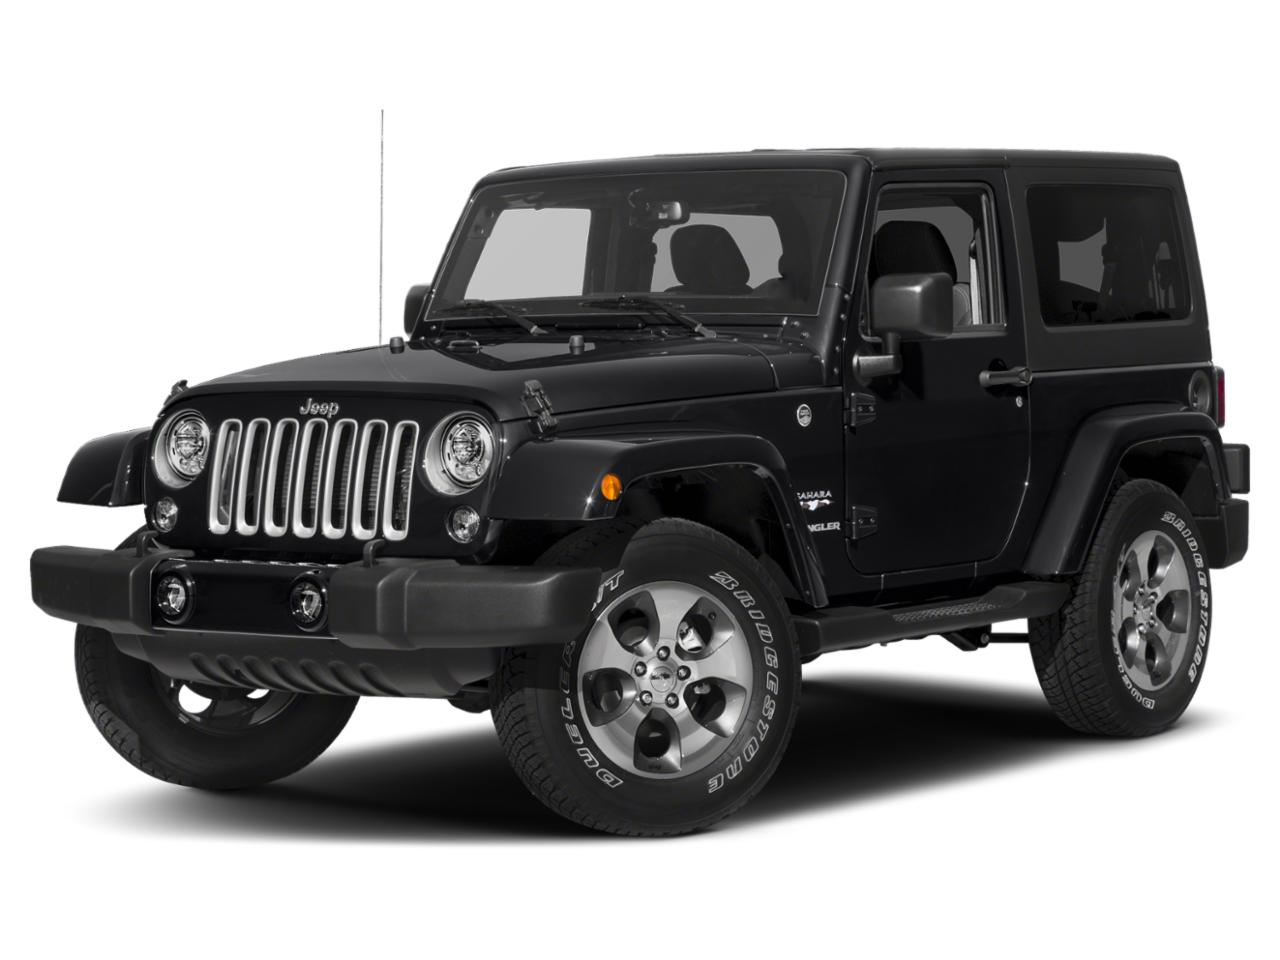 2017 Jeep Wrangler Vehicle Photo in GARDNER, MA 01440-3110